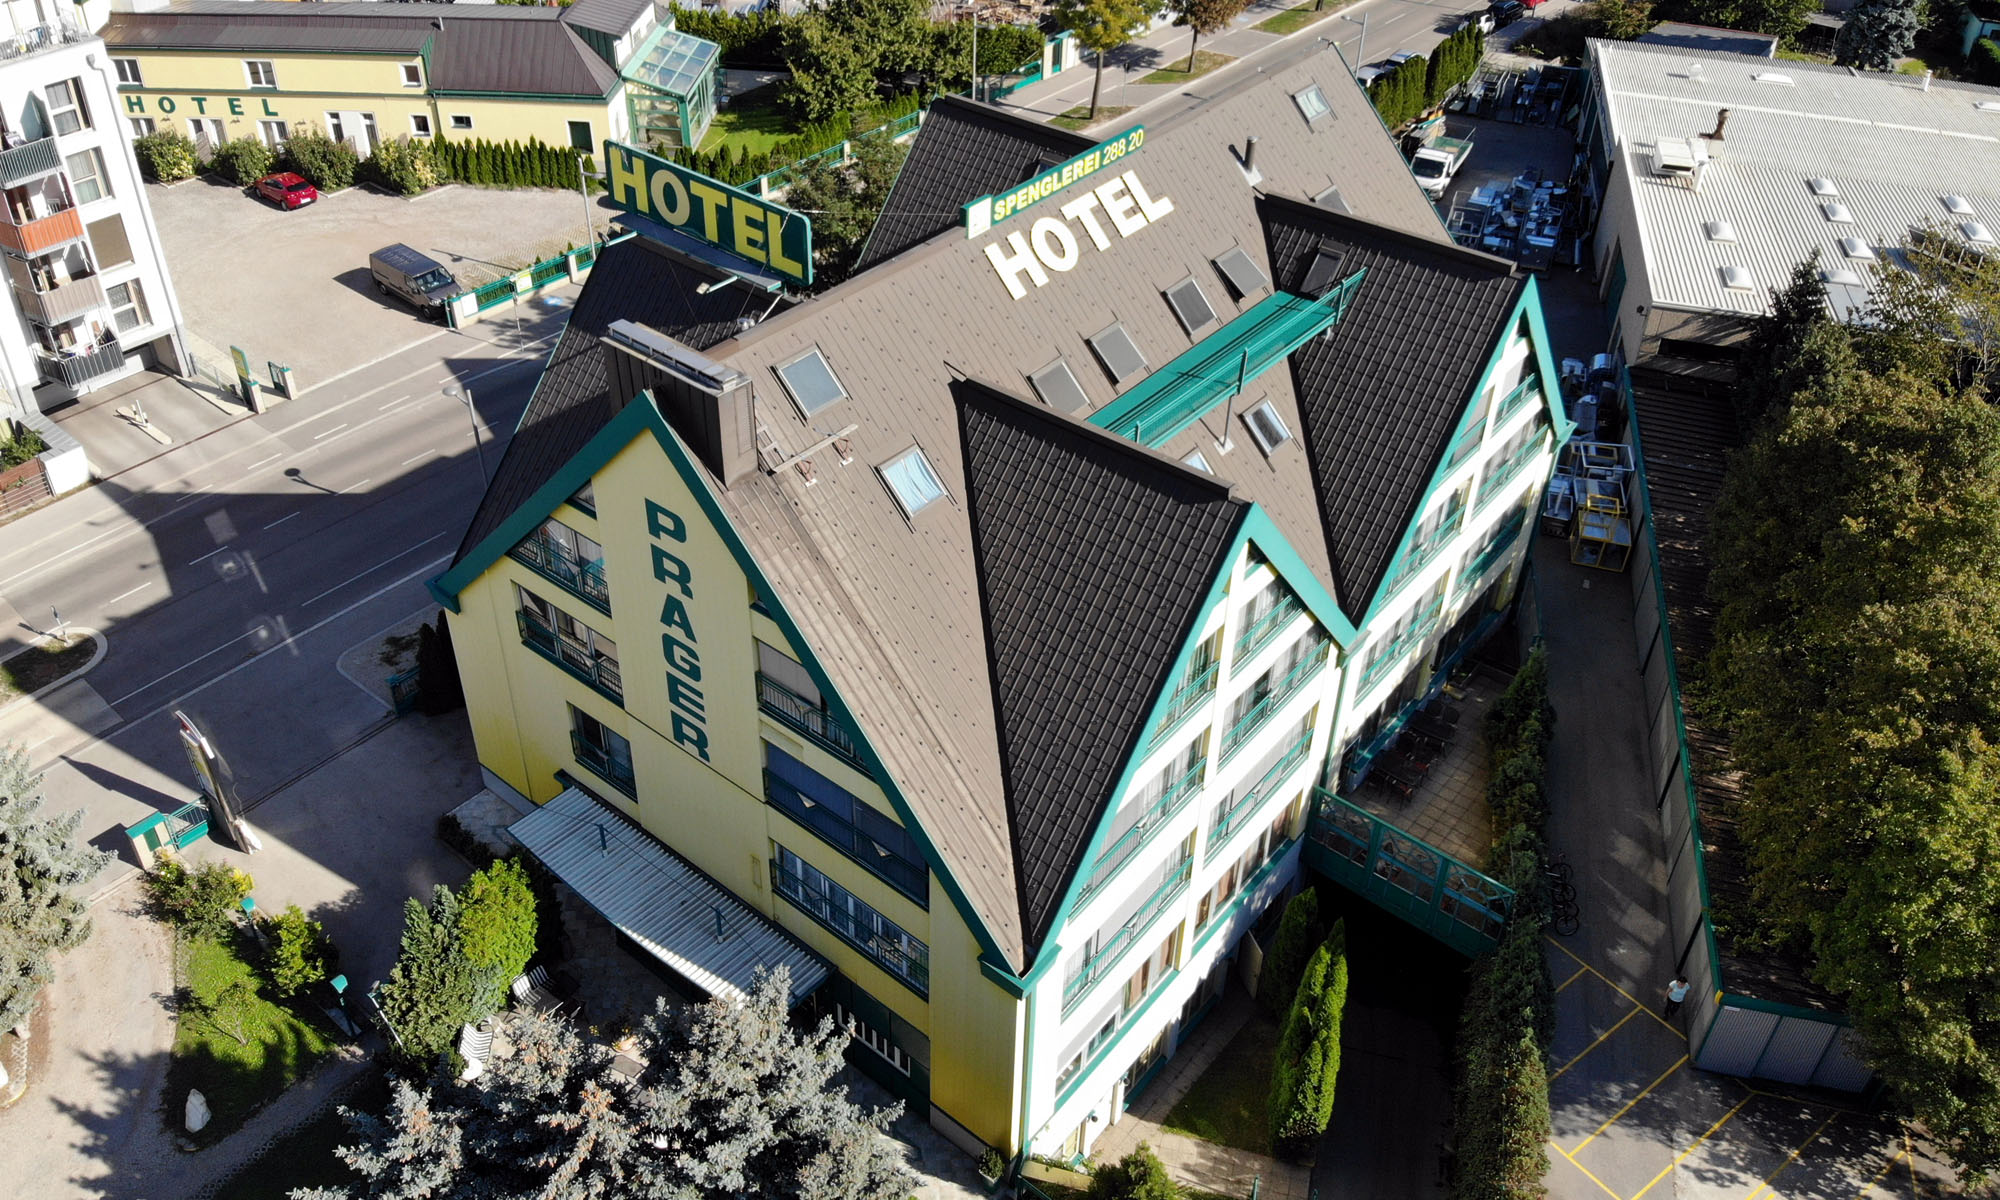 Hotel Prager